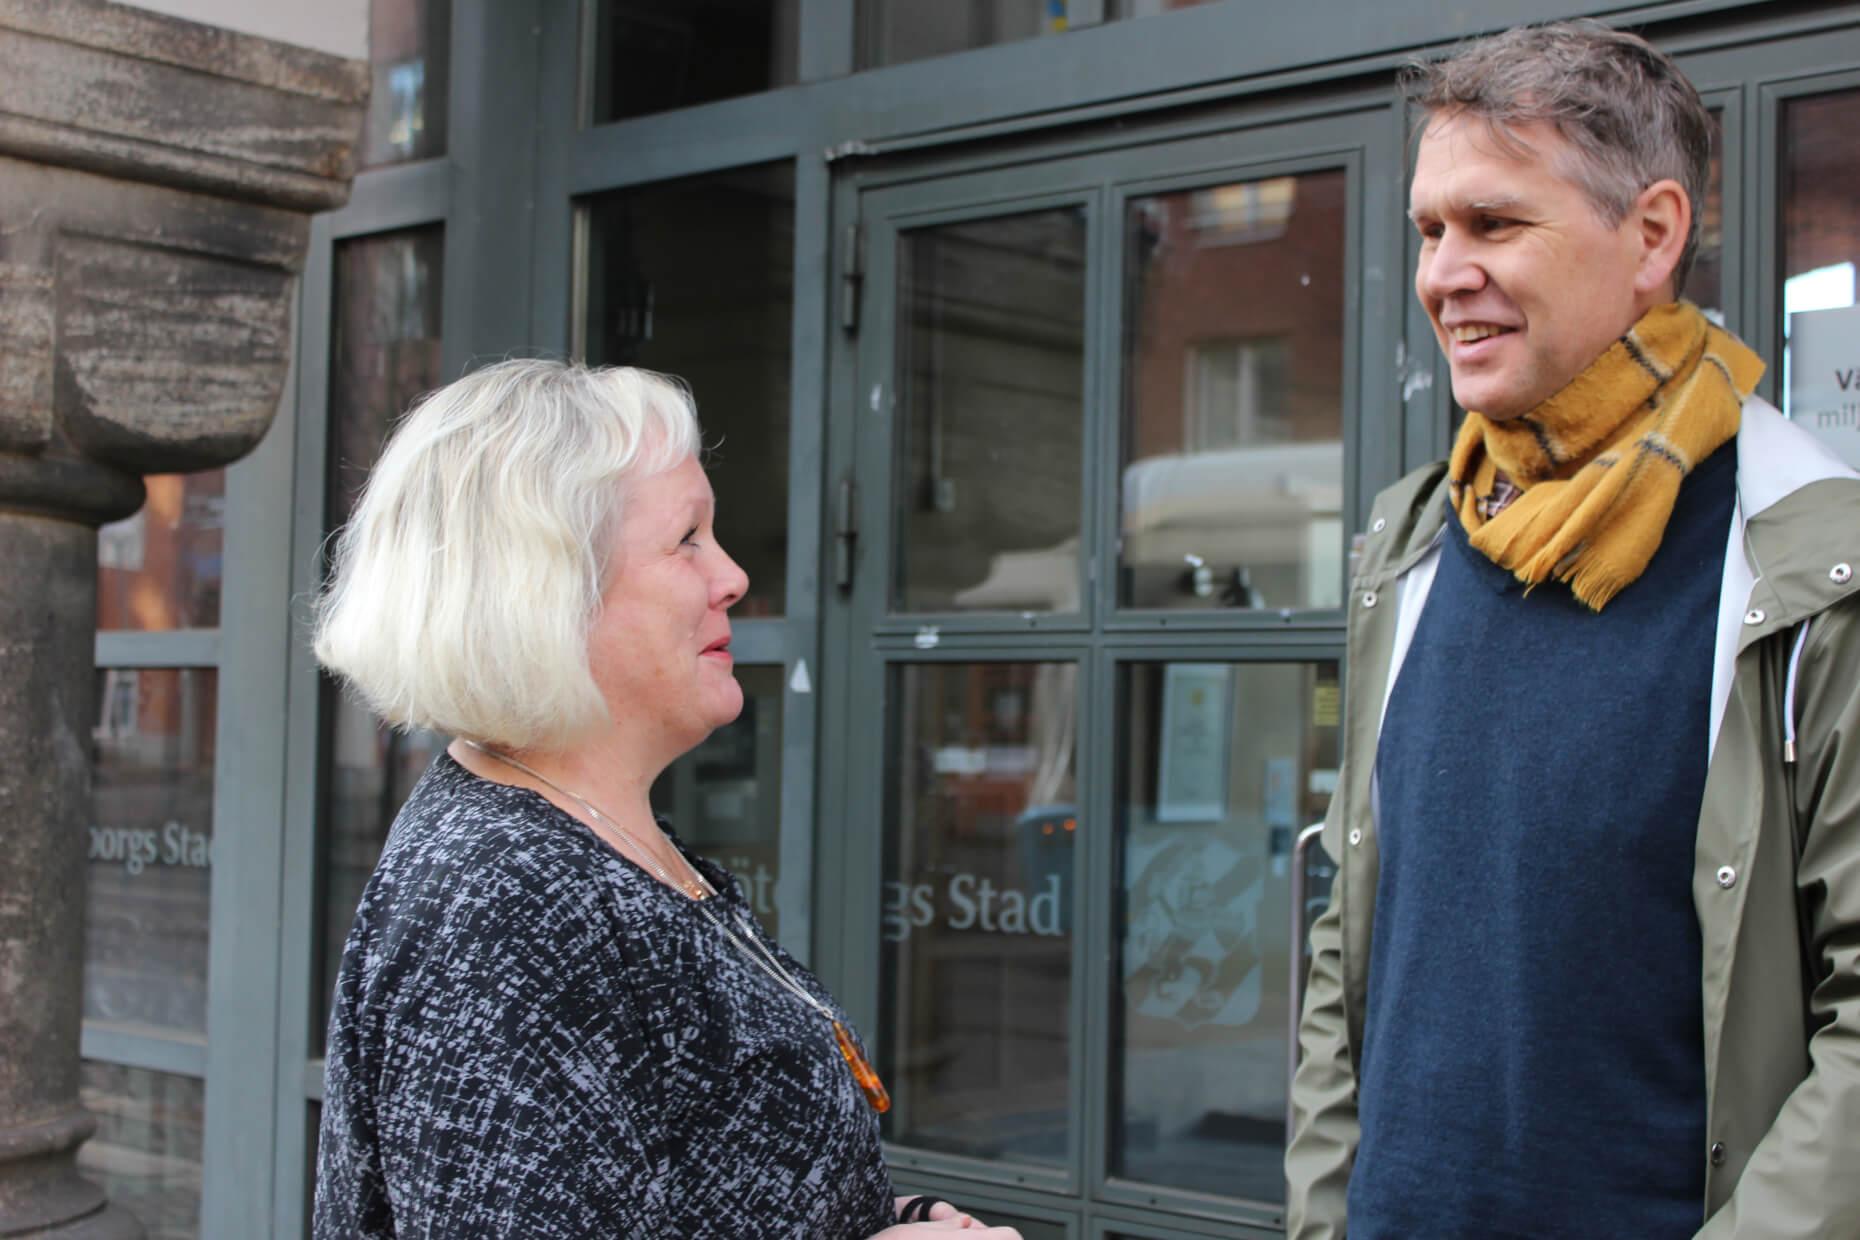 Anna Ledin, Director of the Environmental Administration in the City of Gothenburg, and  Svante Sjöstedt, Environment Analyst, Photo: Vivianne Rosqvist